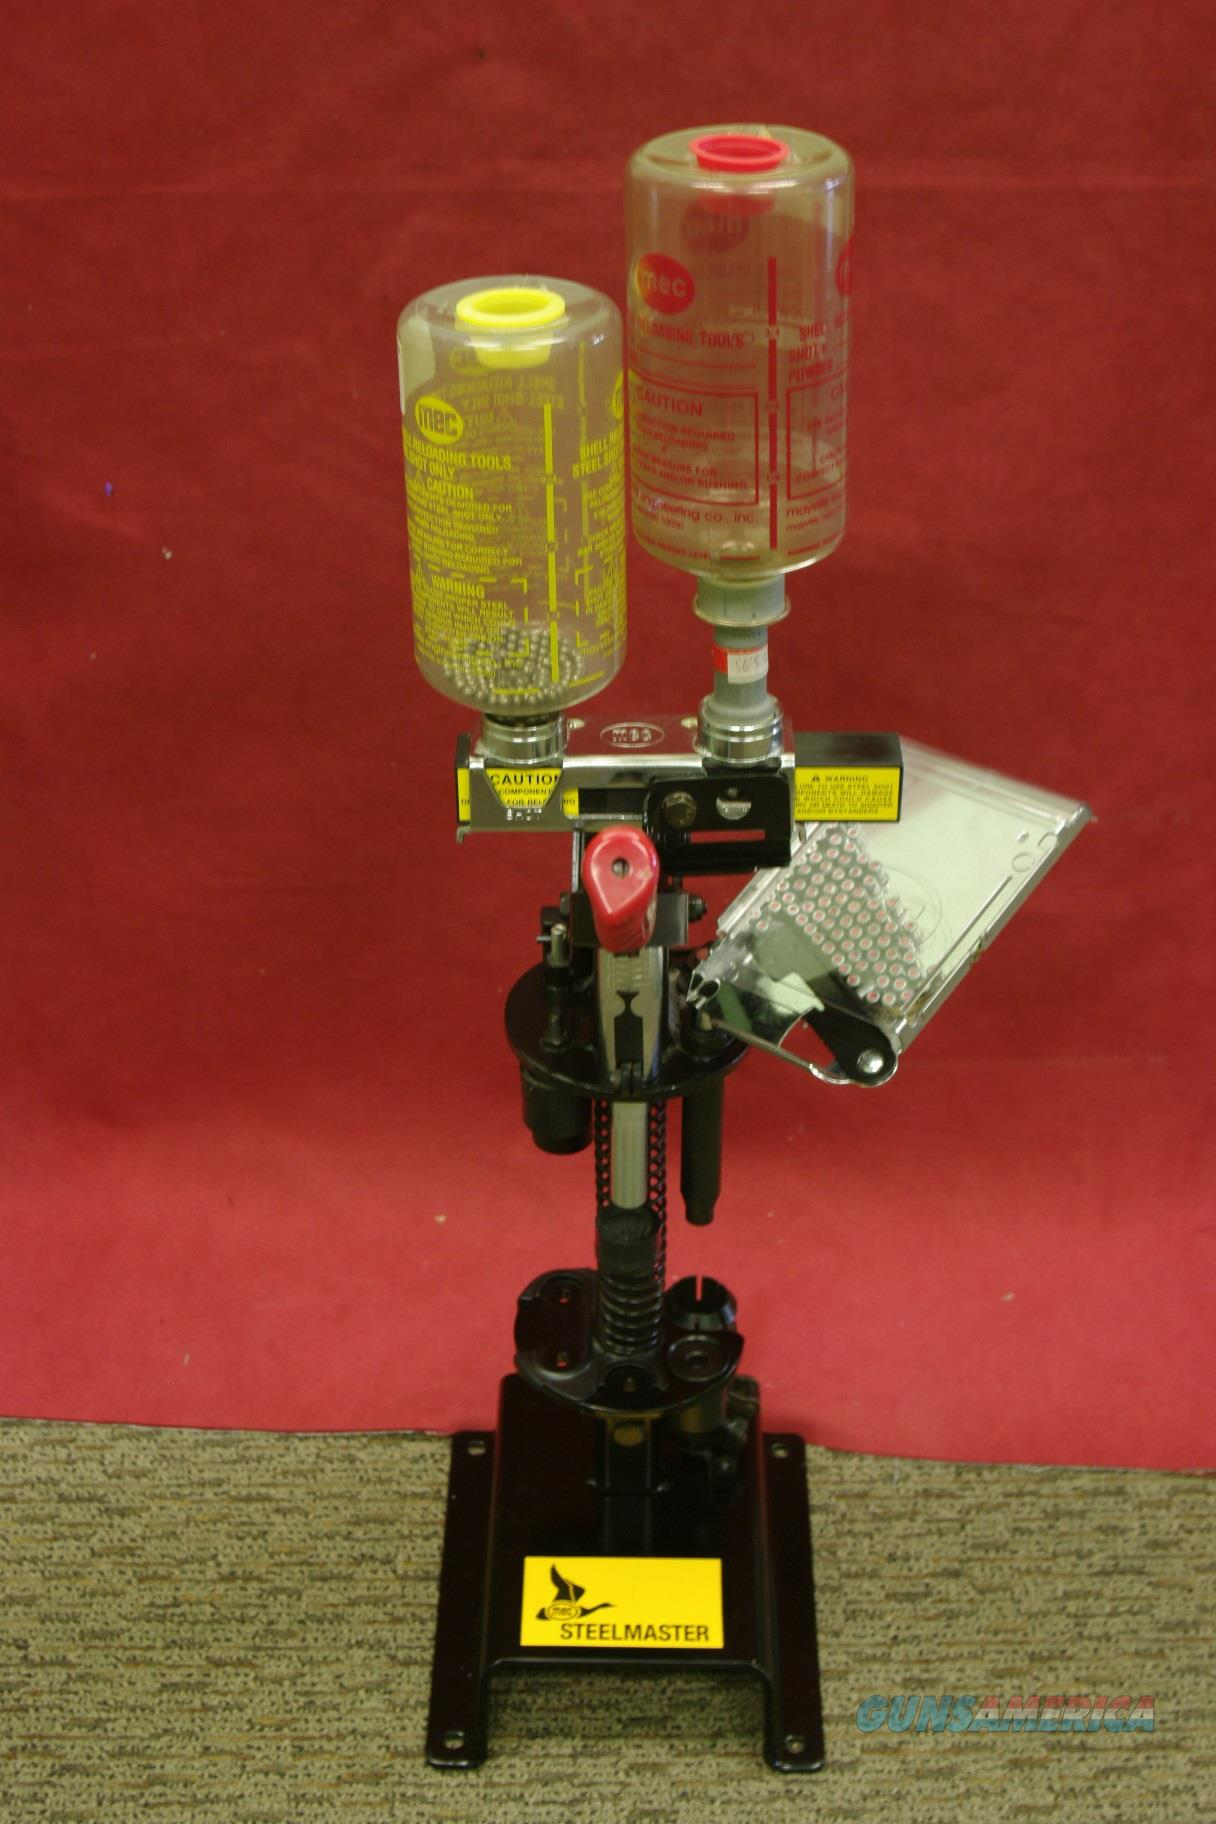 MEC SteelMaster 12 Gauge ShotShell Reloader  Non-Guns > Reloading > Equipment > Shotshell > Presses